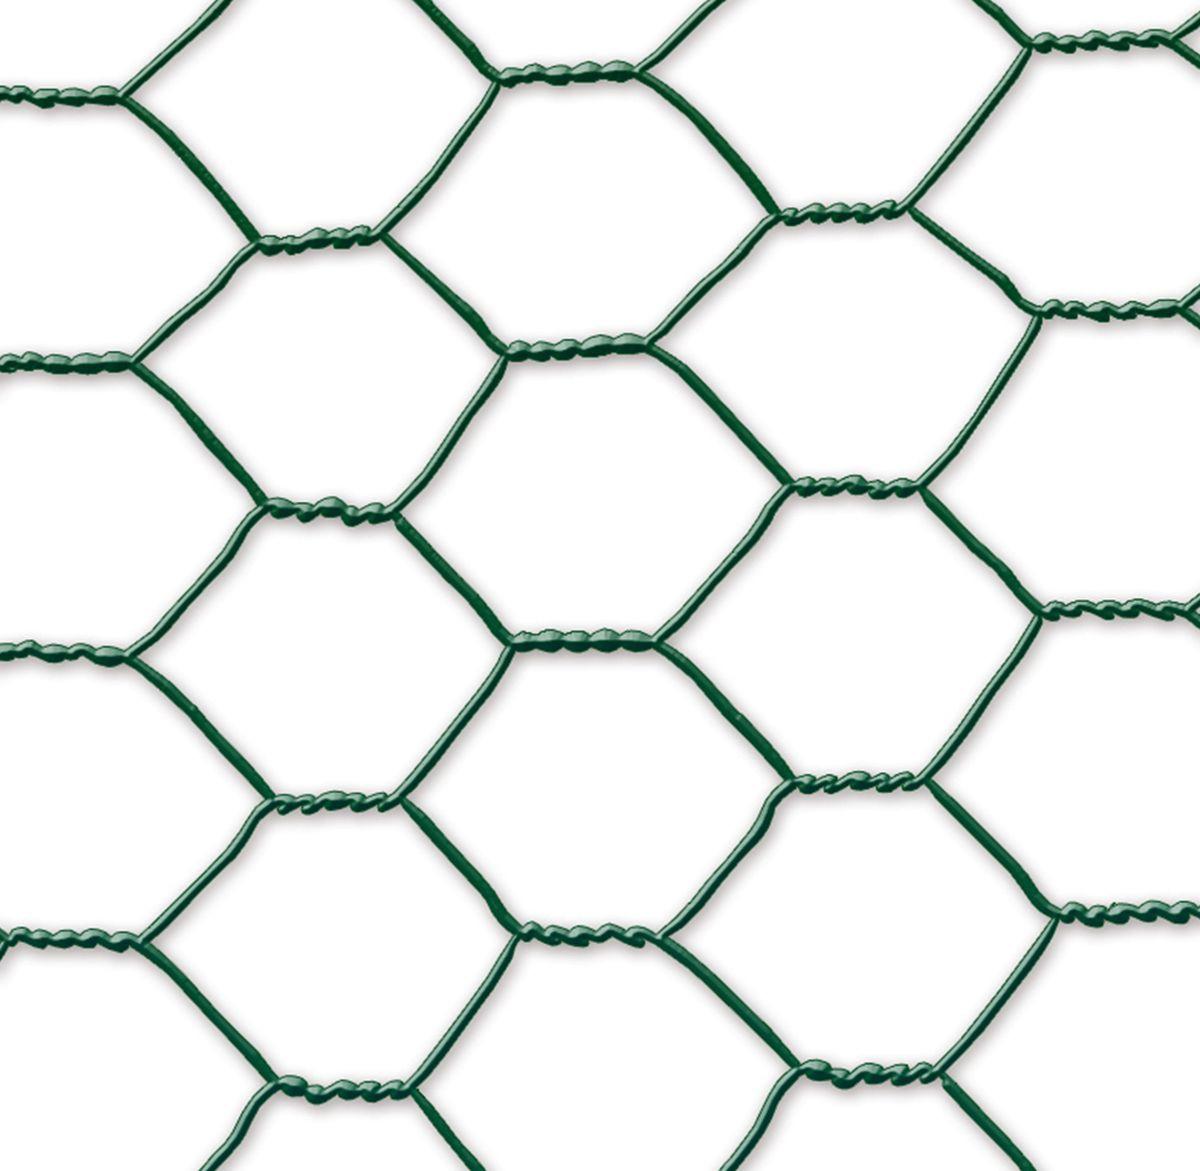 Grillage métal plastifié - 1 x 10 m/41 x 0,8 mm \